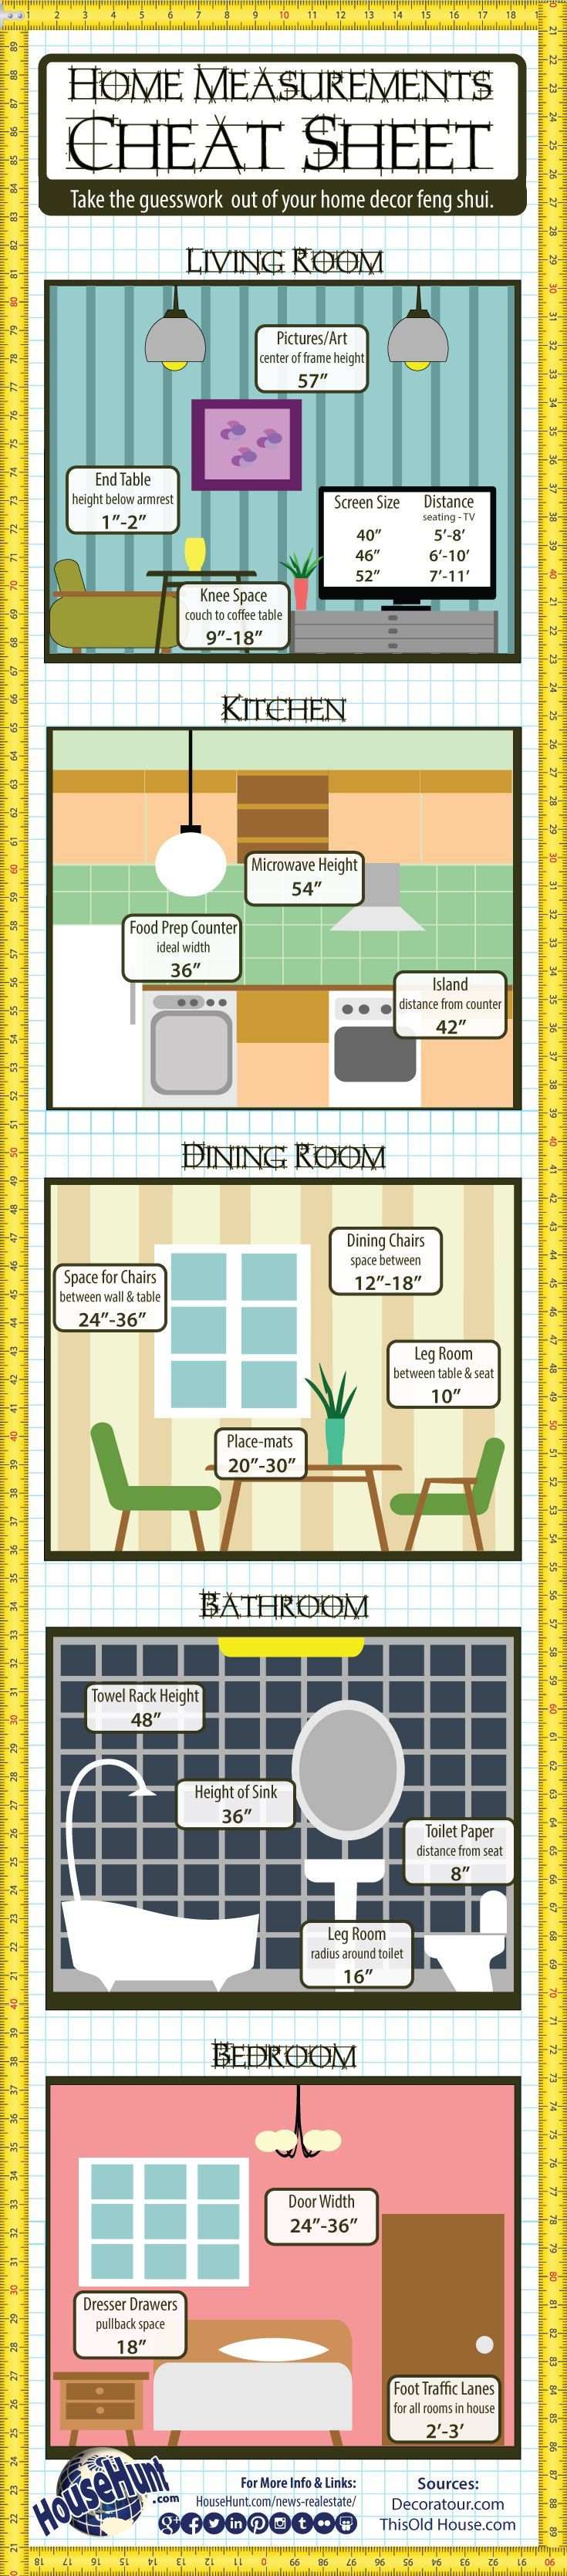 Home Measurements Cheat Sheet Infographic Home Interior Design Interior Design Tips Decor Design